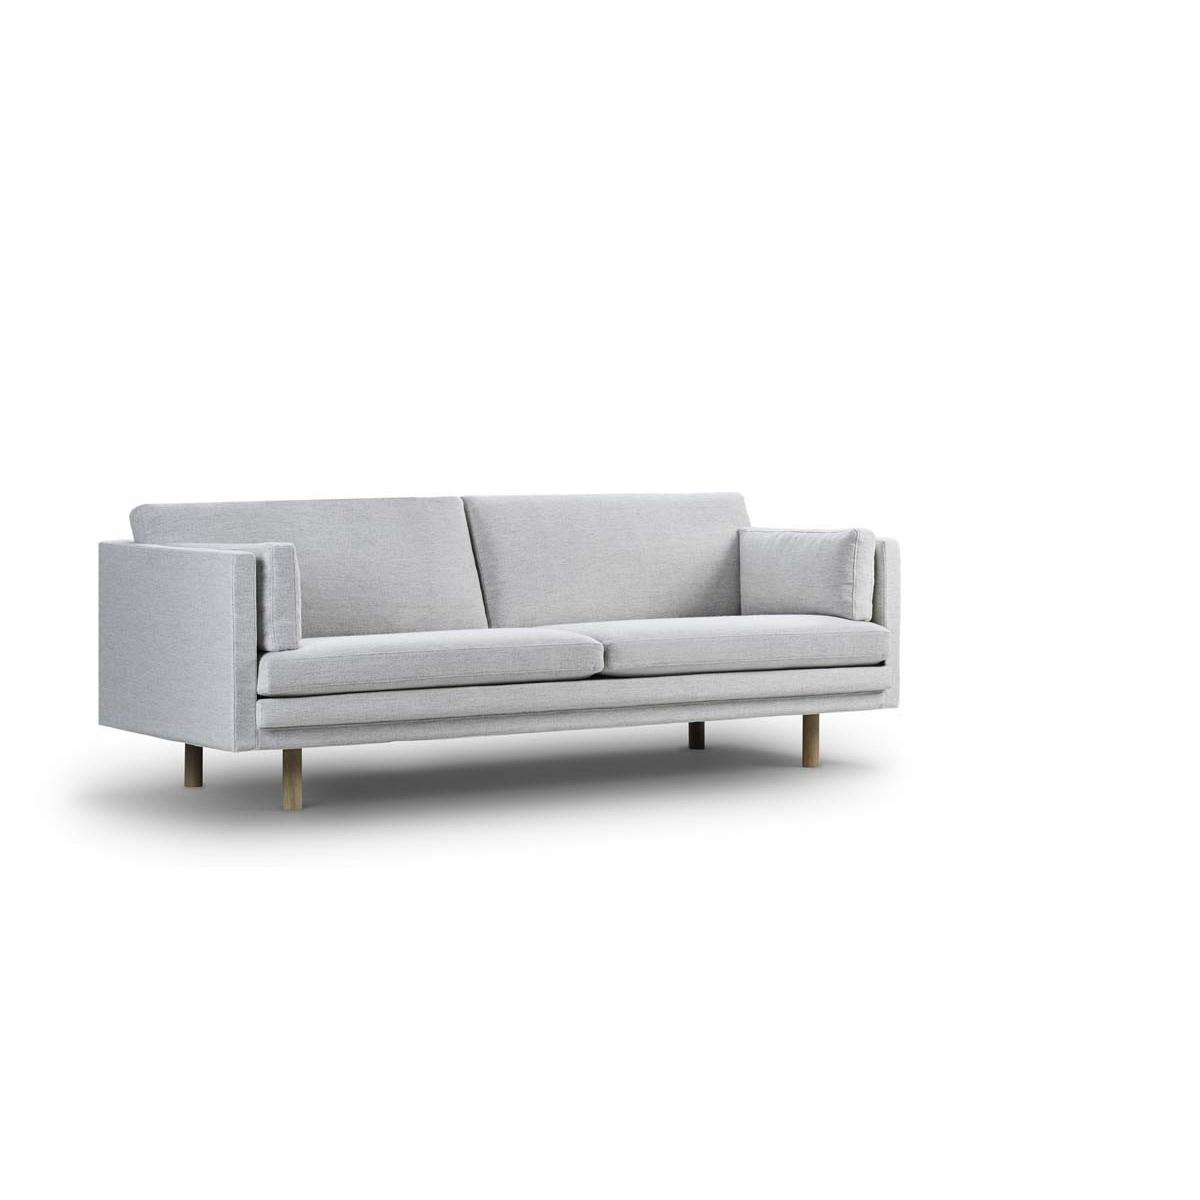 JUUL 954 modul sofa - Nine five four | Bolighuset Werenberg